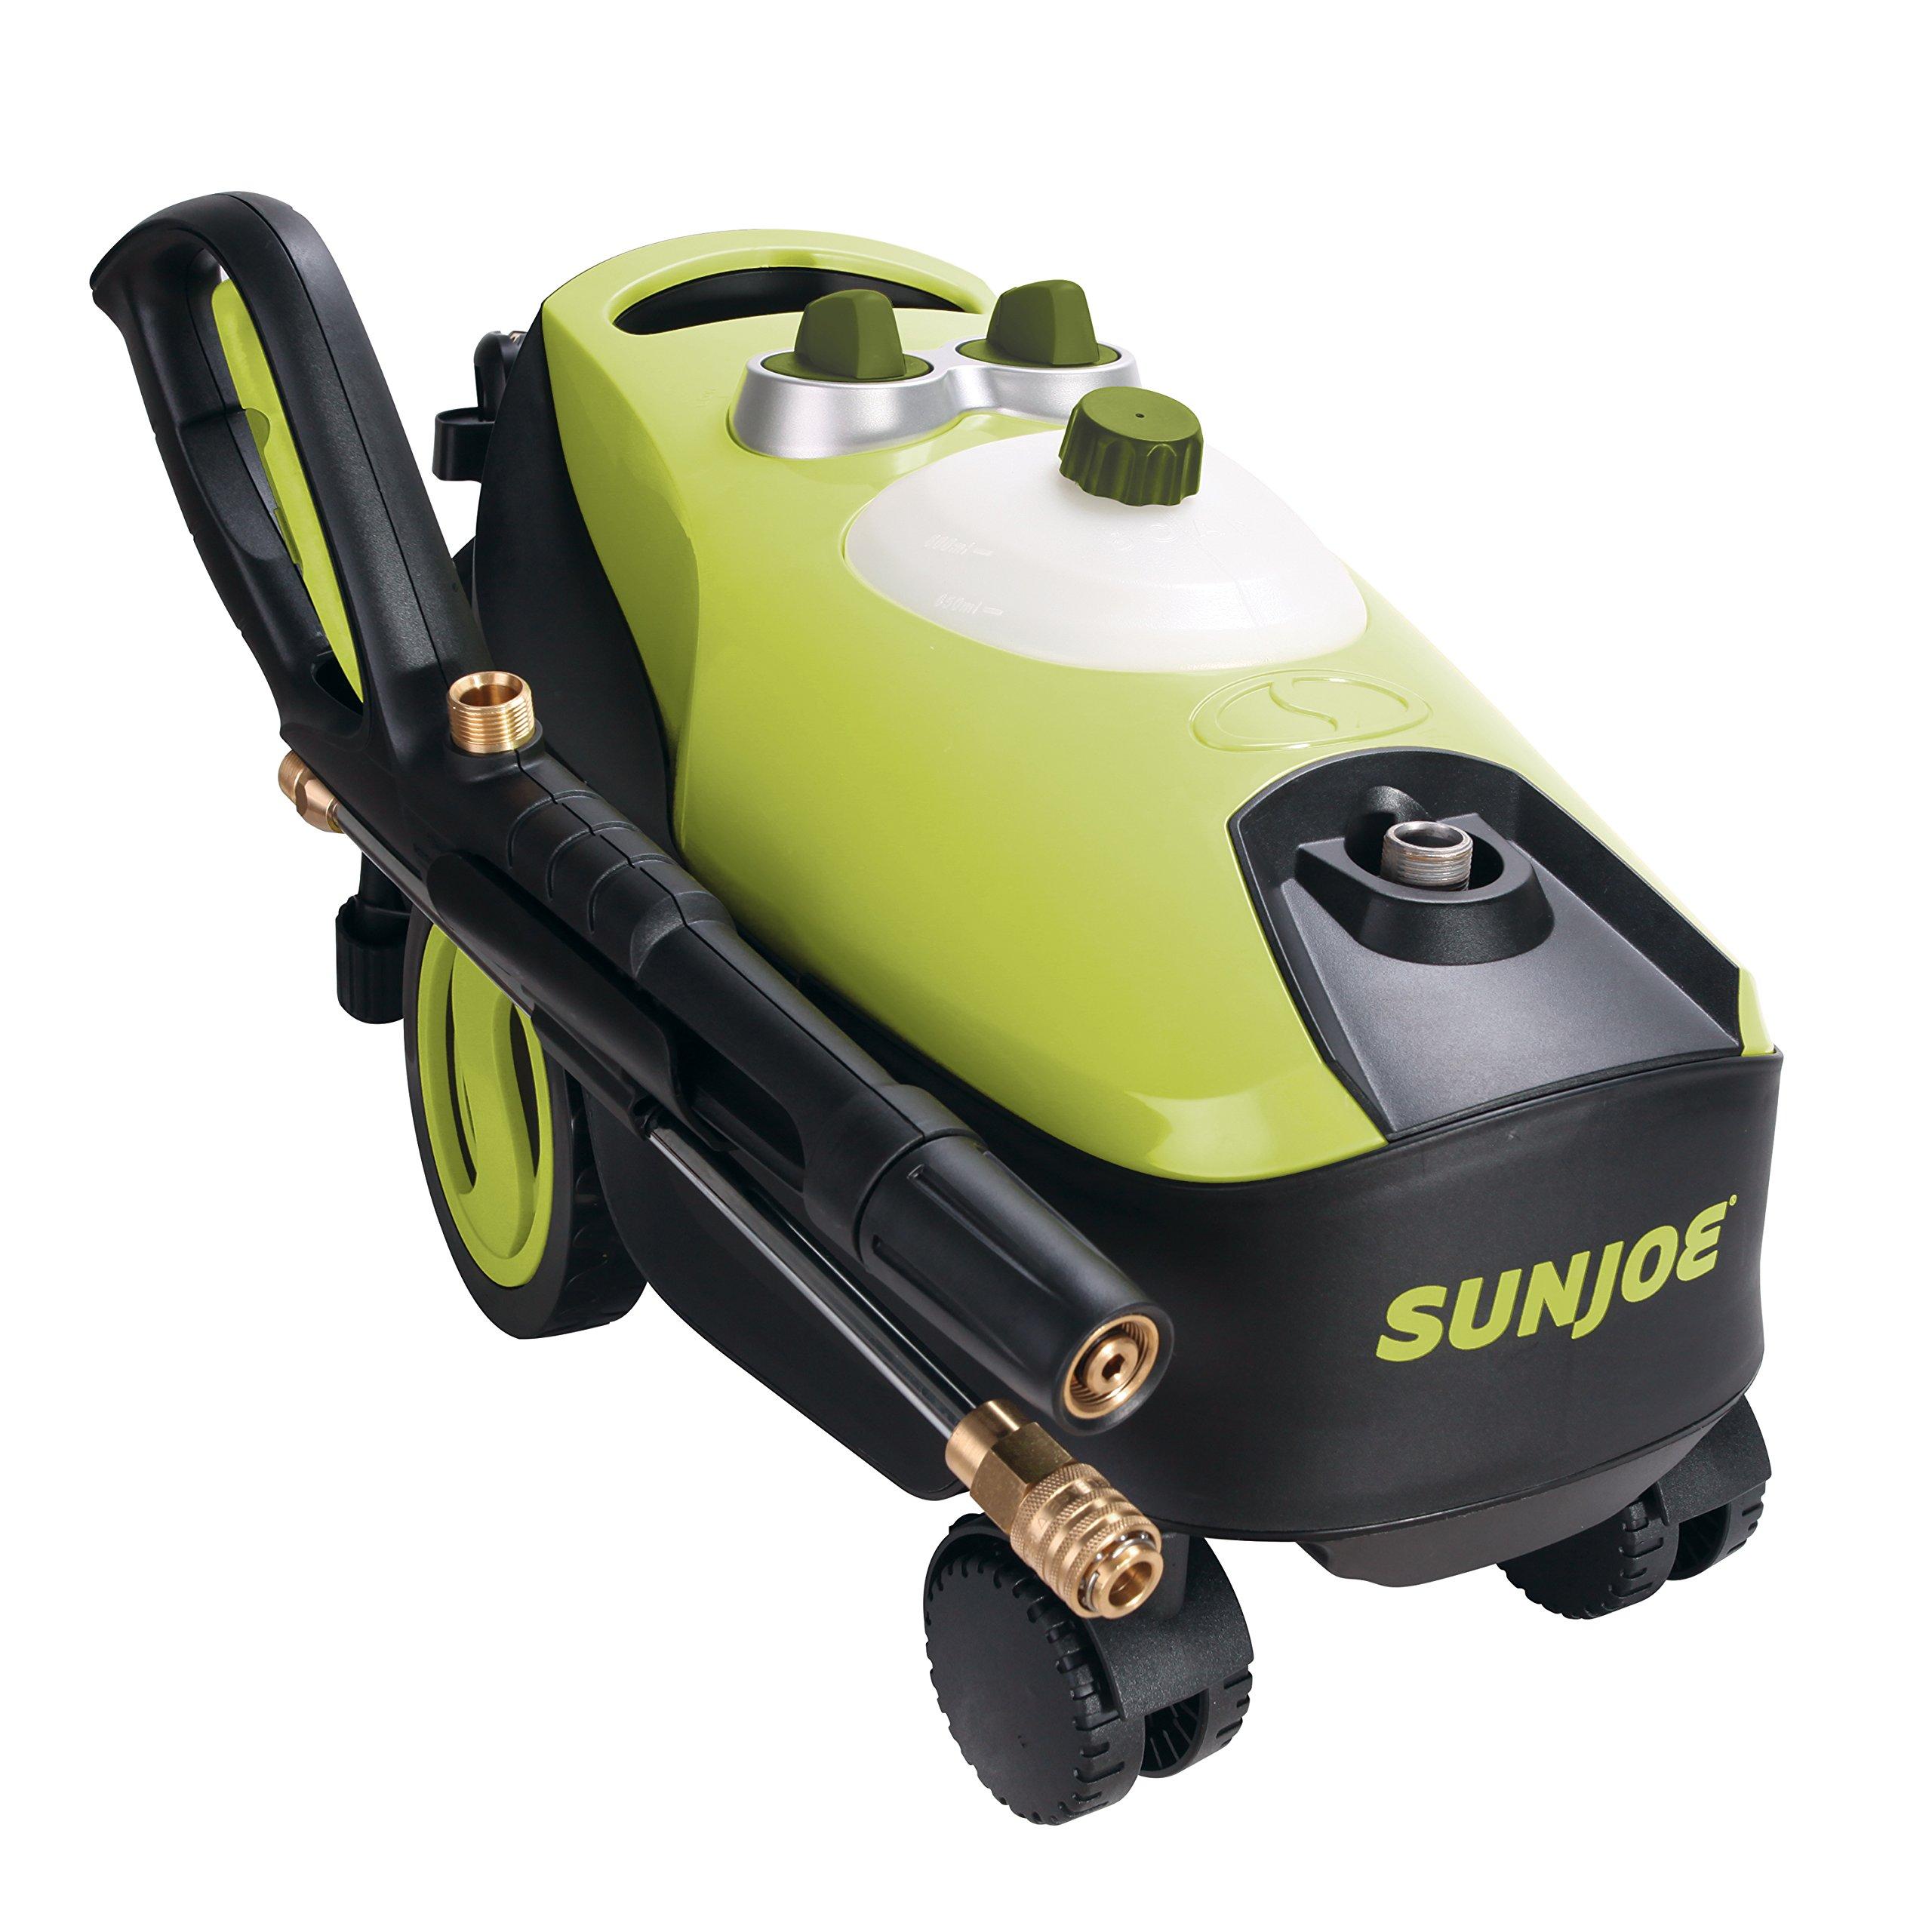 Snow Joe Sun Joe SPX3200 1.76 GPM 14.5-Amp 2030 PSI (Max) GO ANYWHERE Electric Pressure Washer